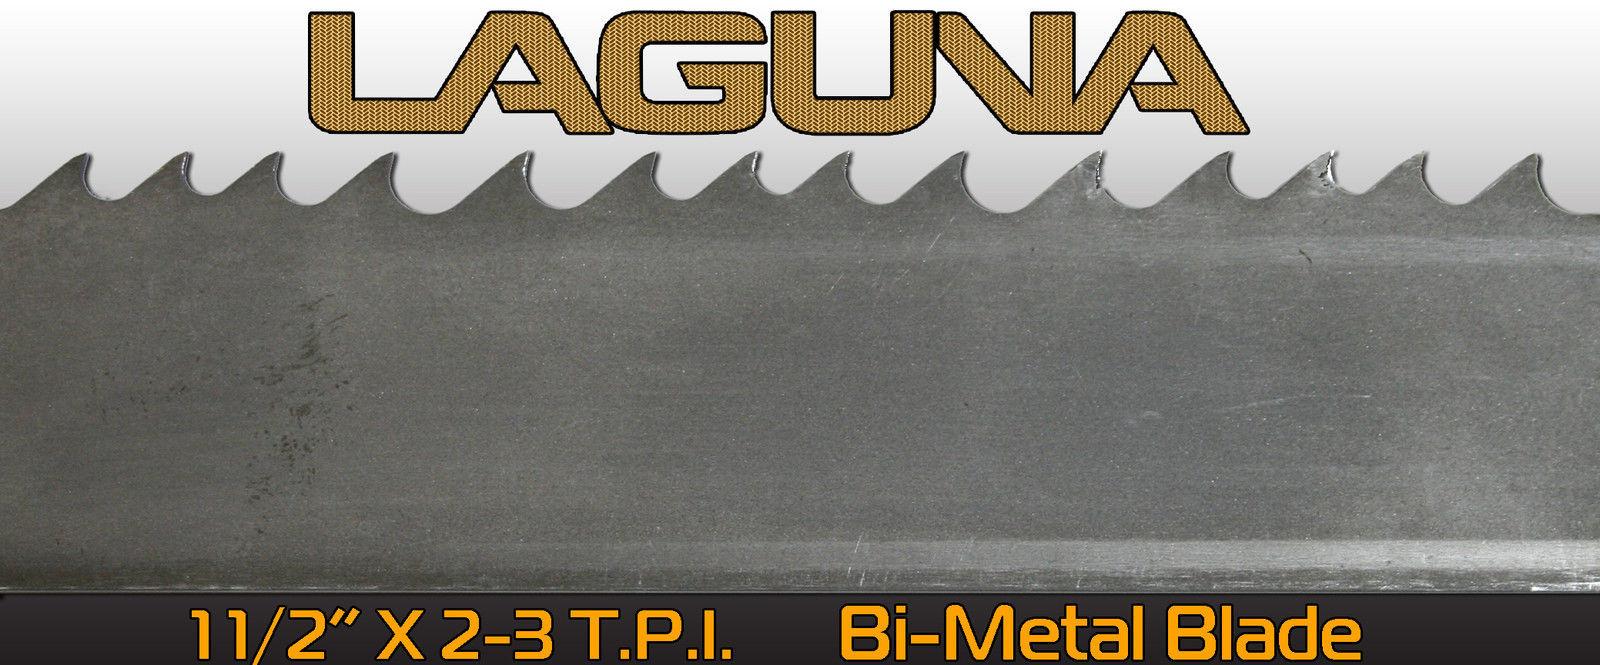 "1 1/2"" 2-3 TPI X 150"" Bimetal BandSaw Blade Laguna Tools Metal Cutting Blade"